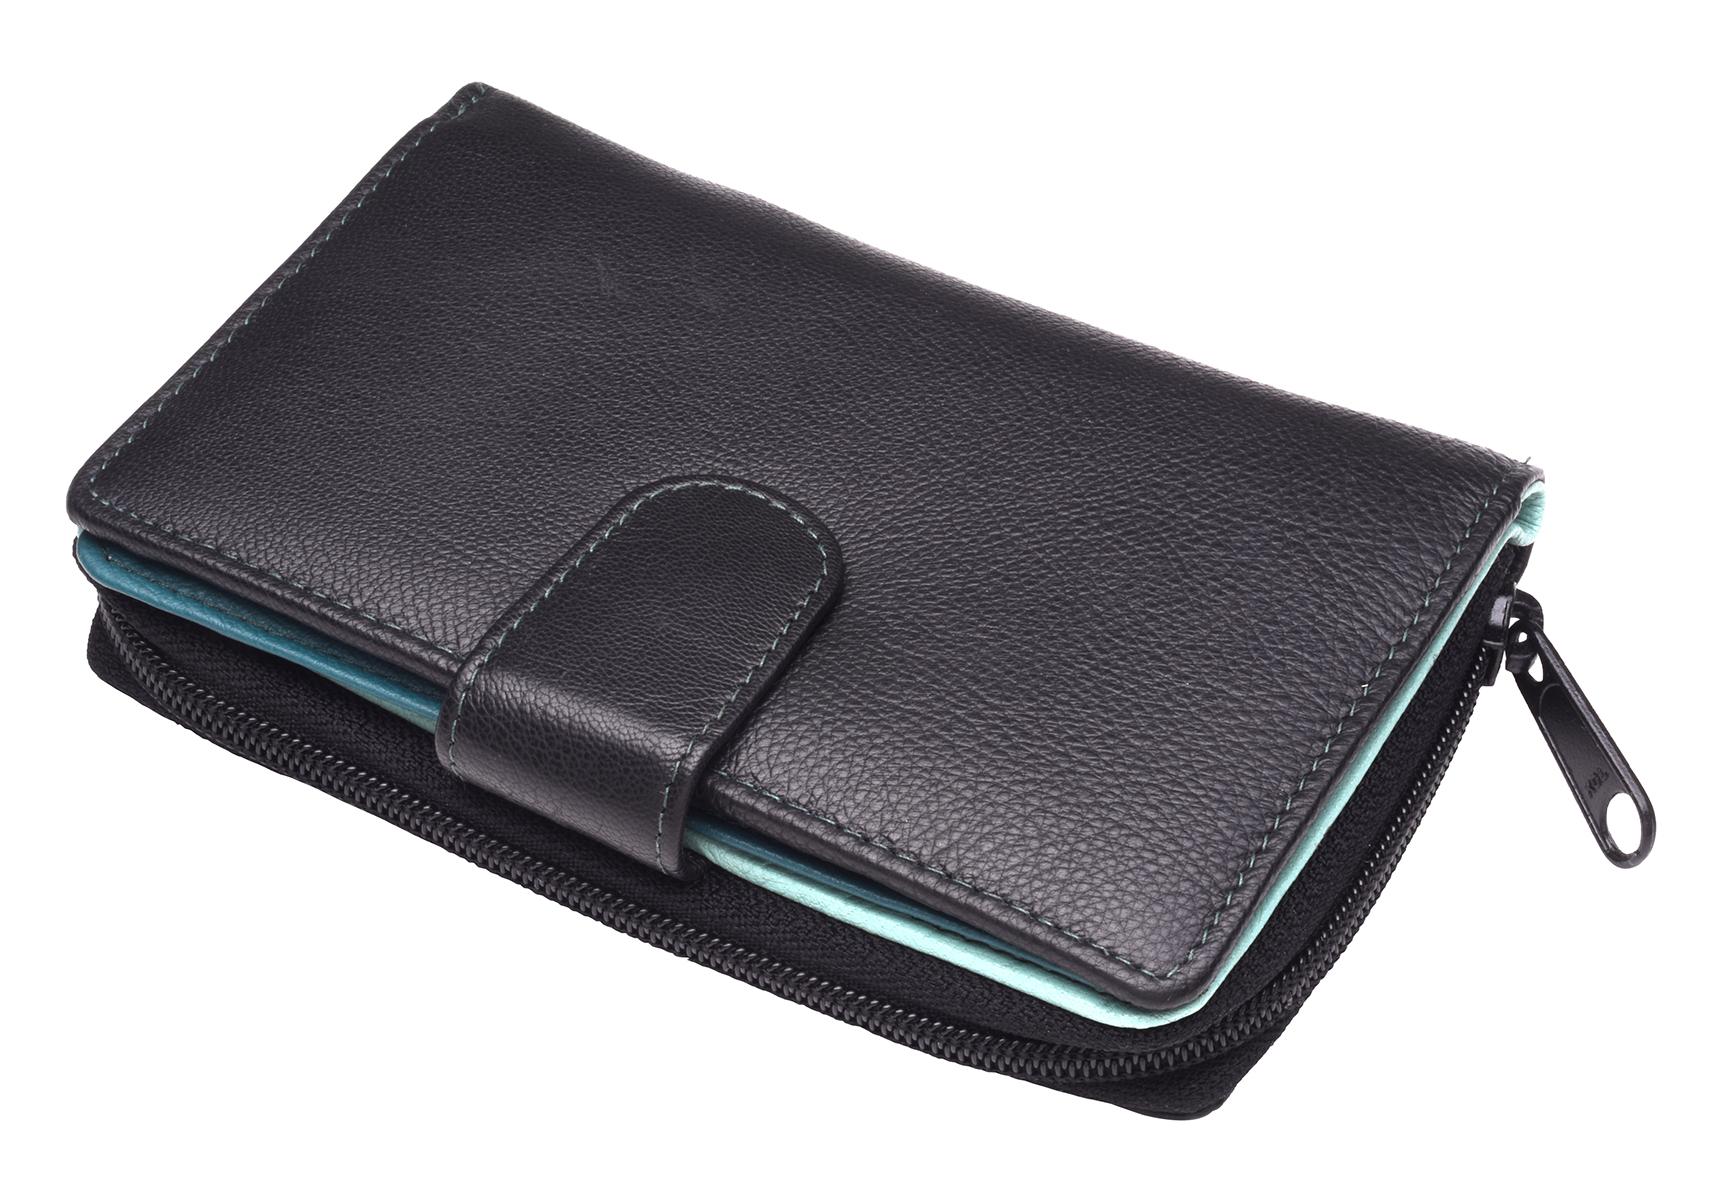 Ladies-Womens-RFID-Blocking-Safe-Leather-Bifold-Medium-Purse-Wallet-Coin-Section thumbnail 19